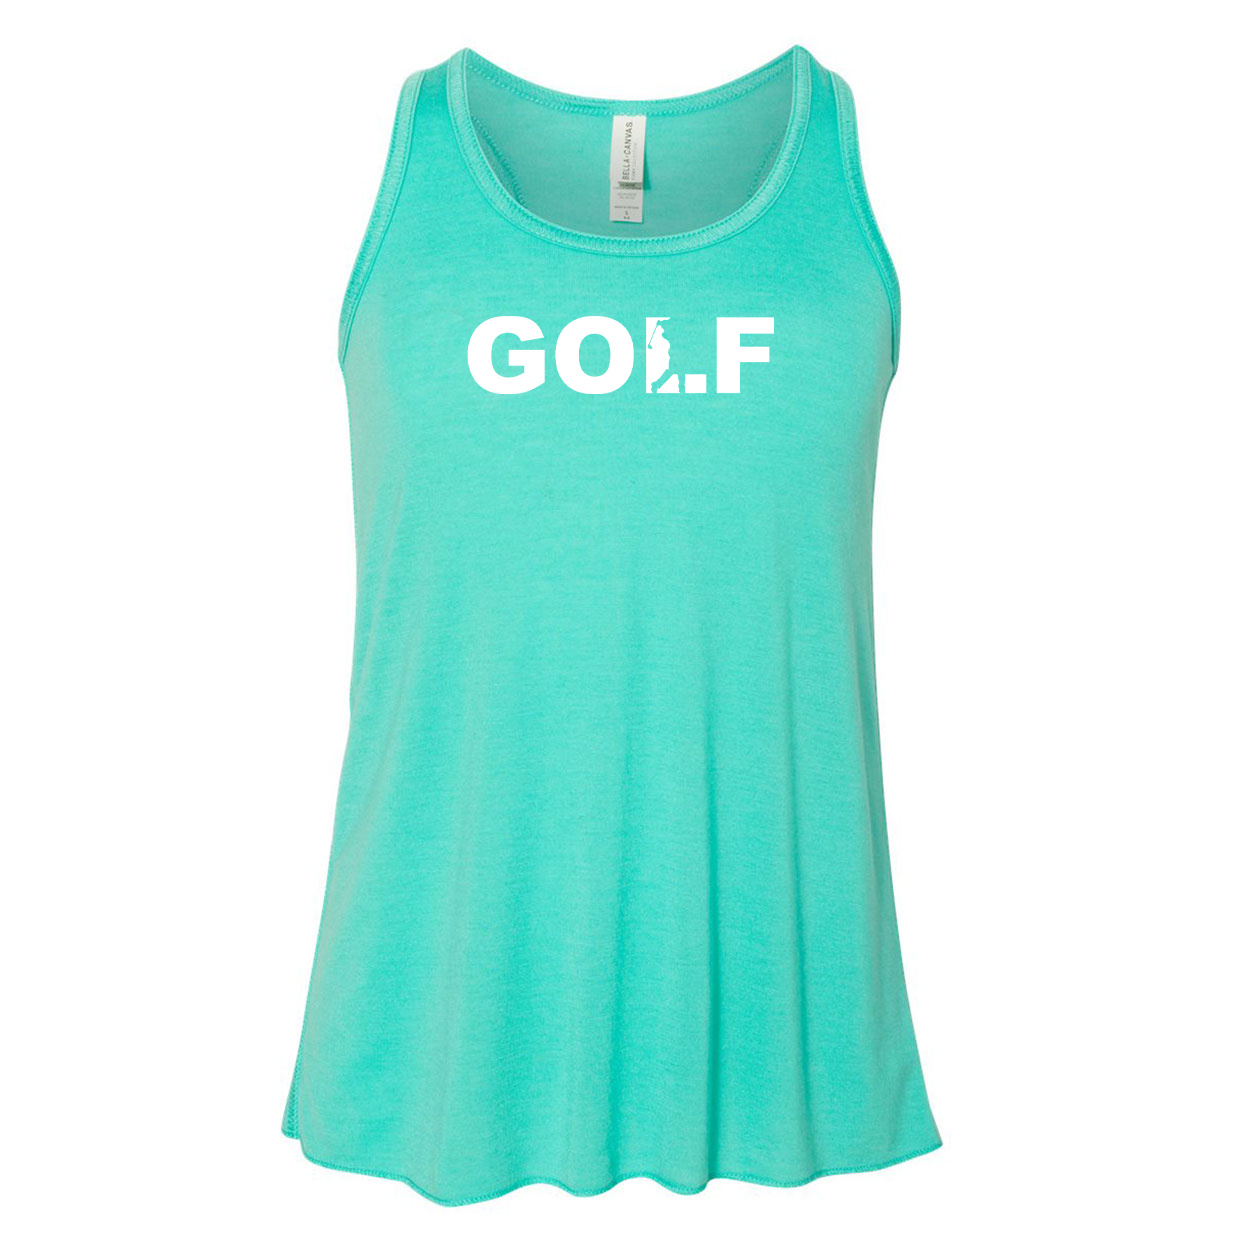 Golf Swing Logo Classic Youth Girls Flowy Racerback Tank Top Teal (White Logo)